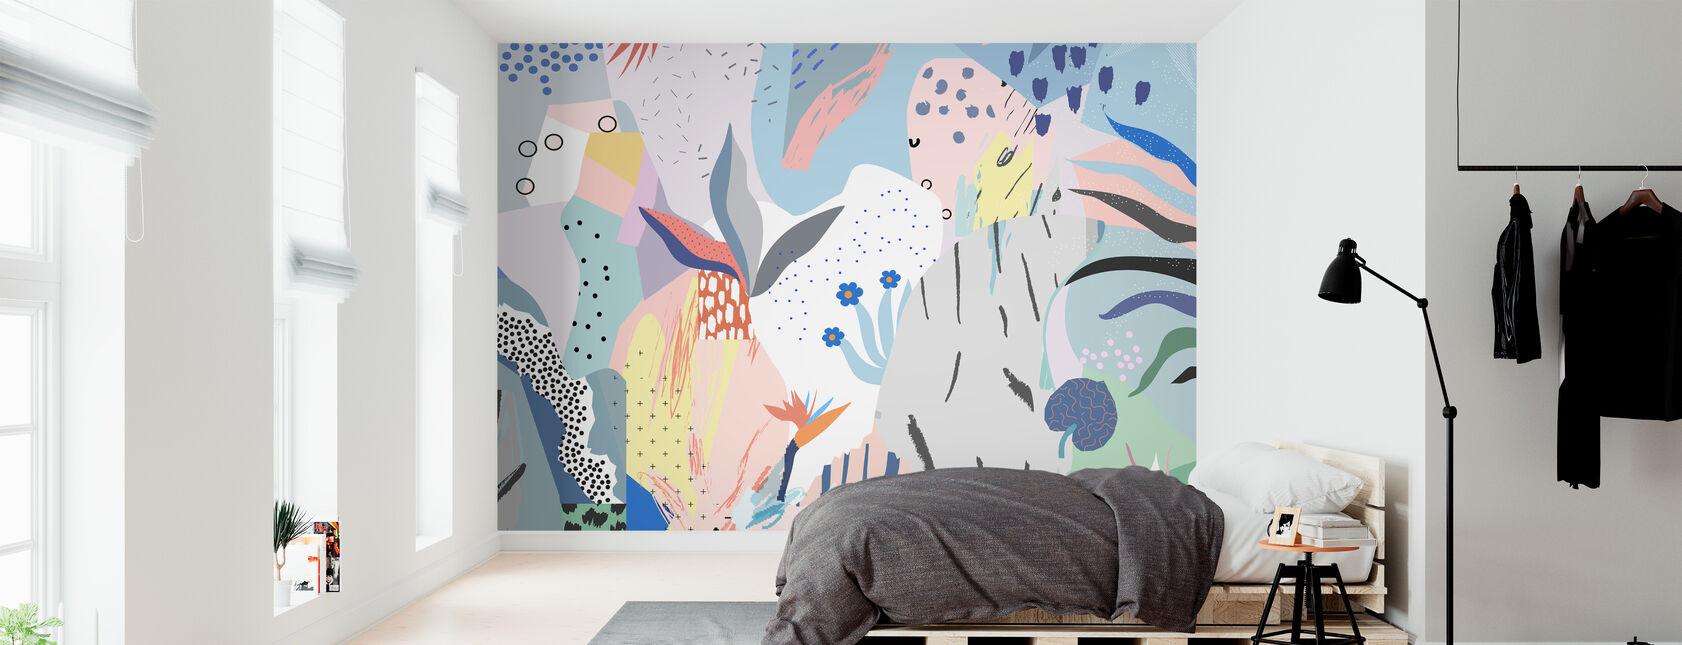 Flowery - Wallpaper - Bedroom